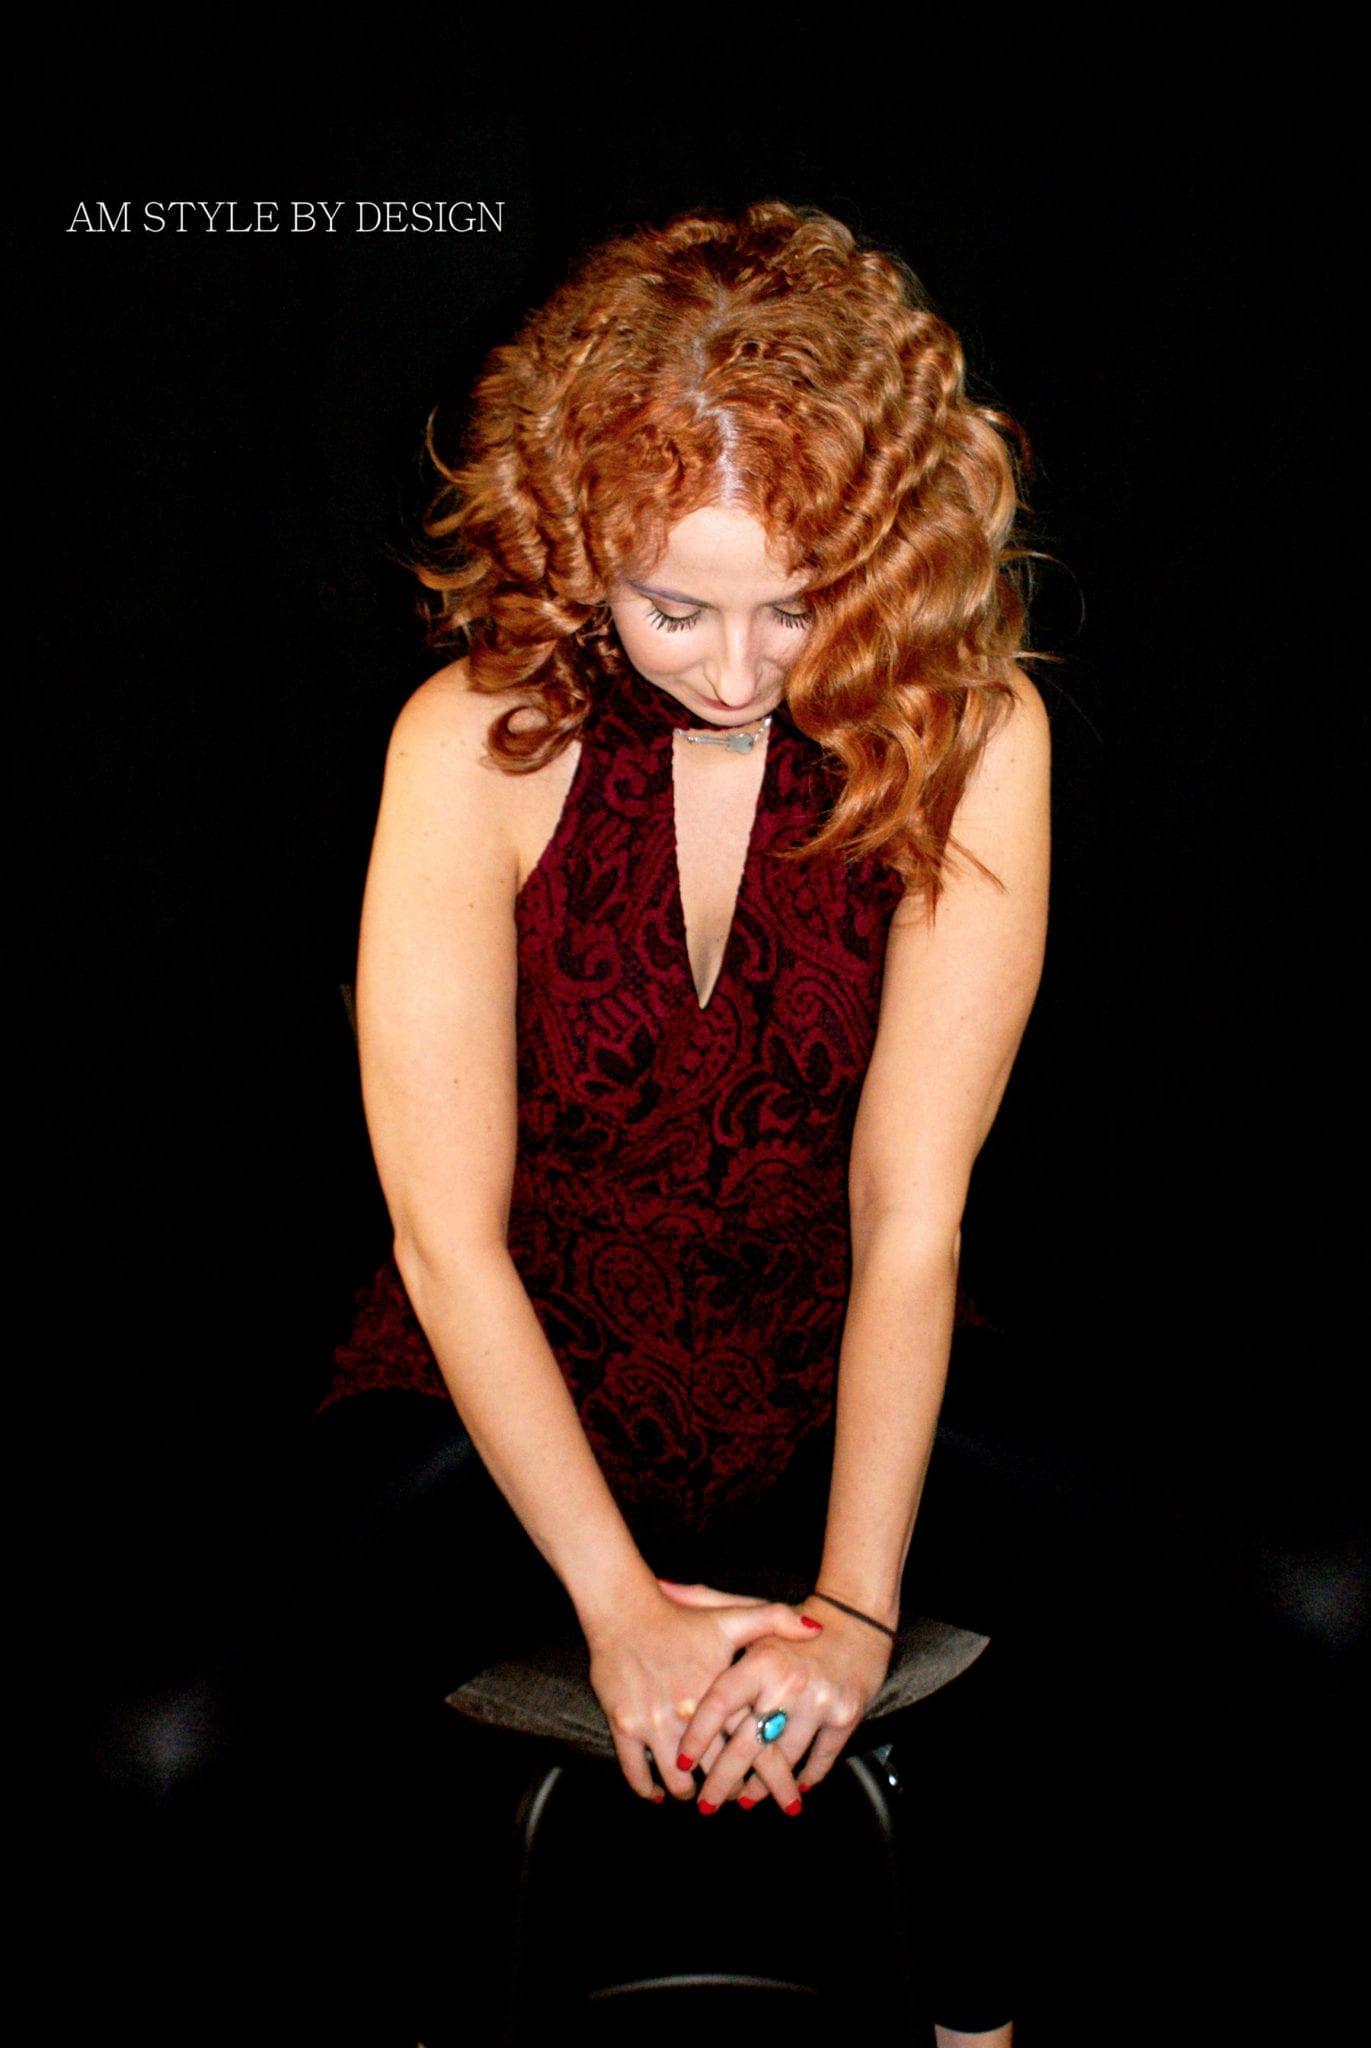 Hair & Make-up- Angela Model: Kim Photographer-Angela Location- Atlanta, GA